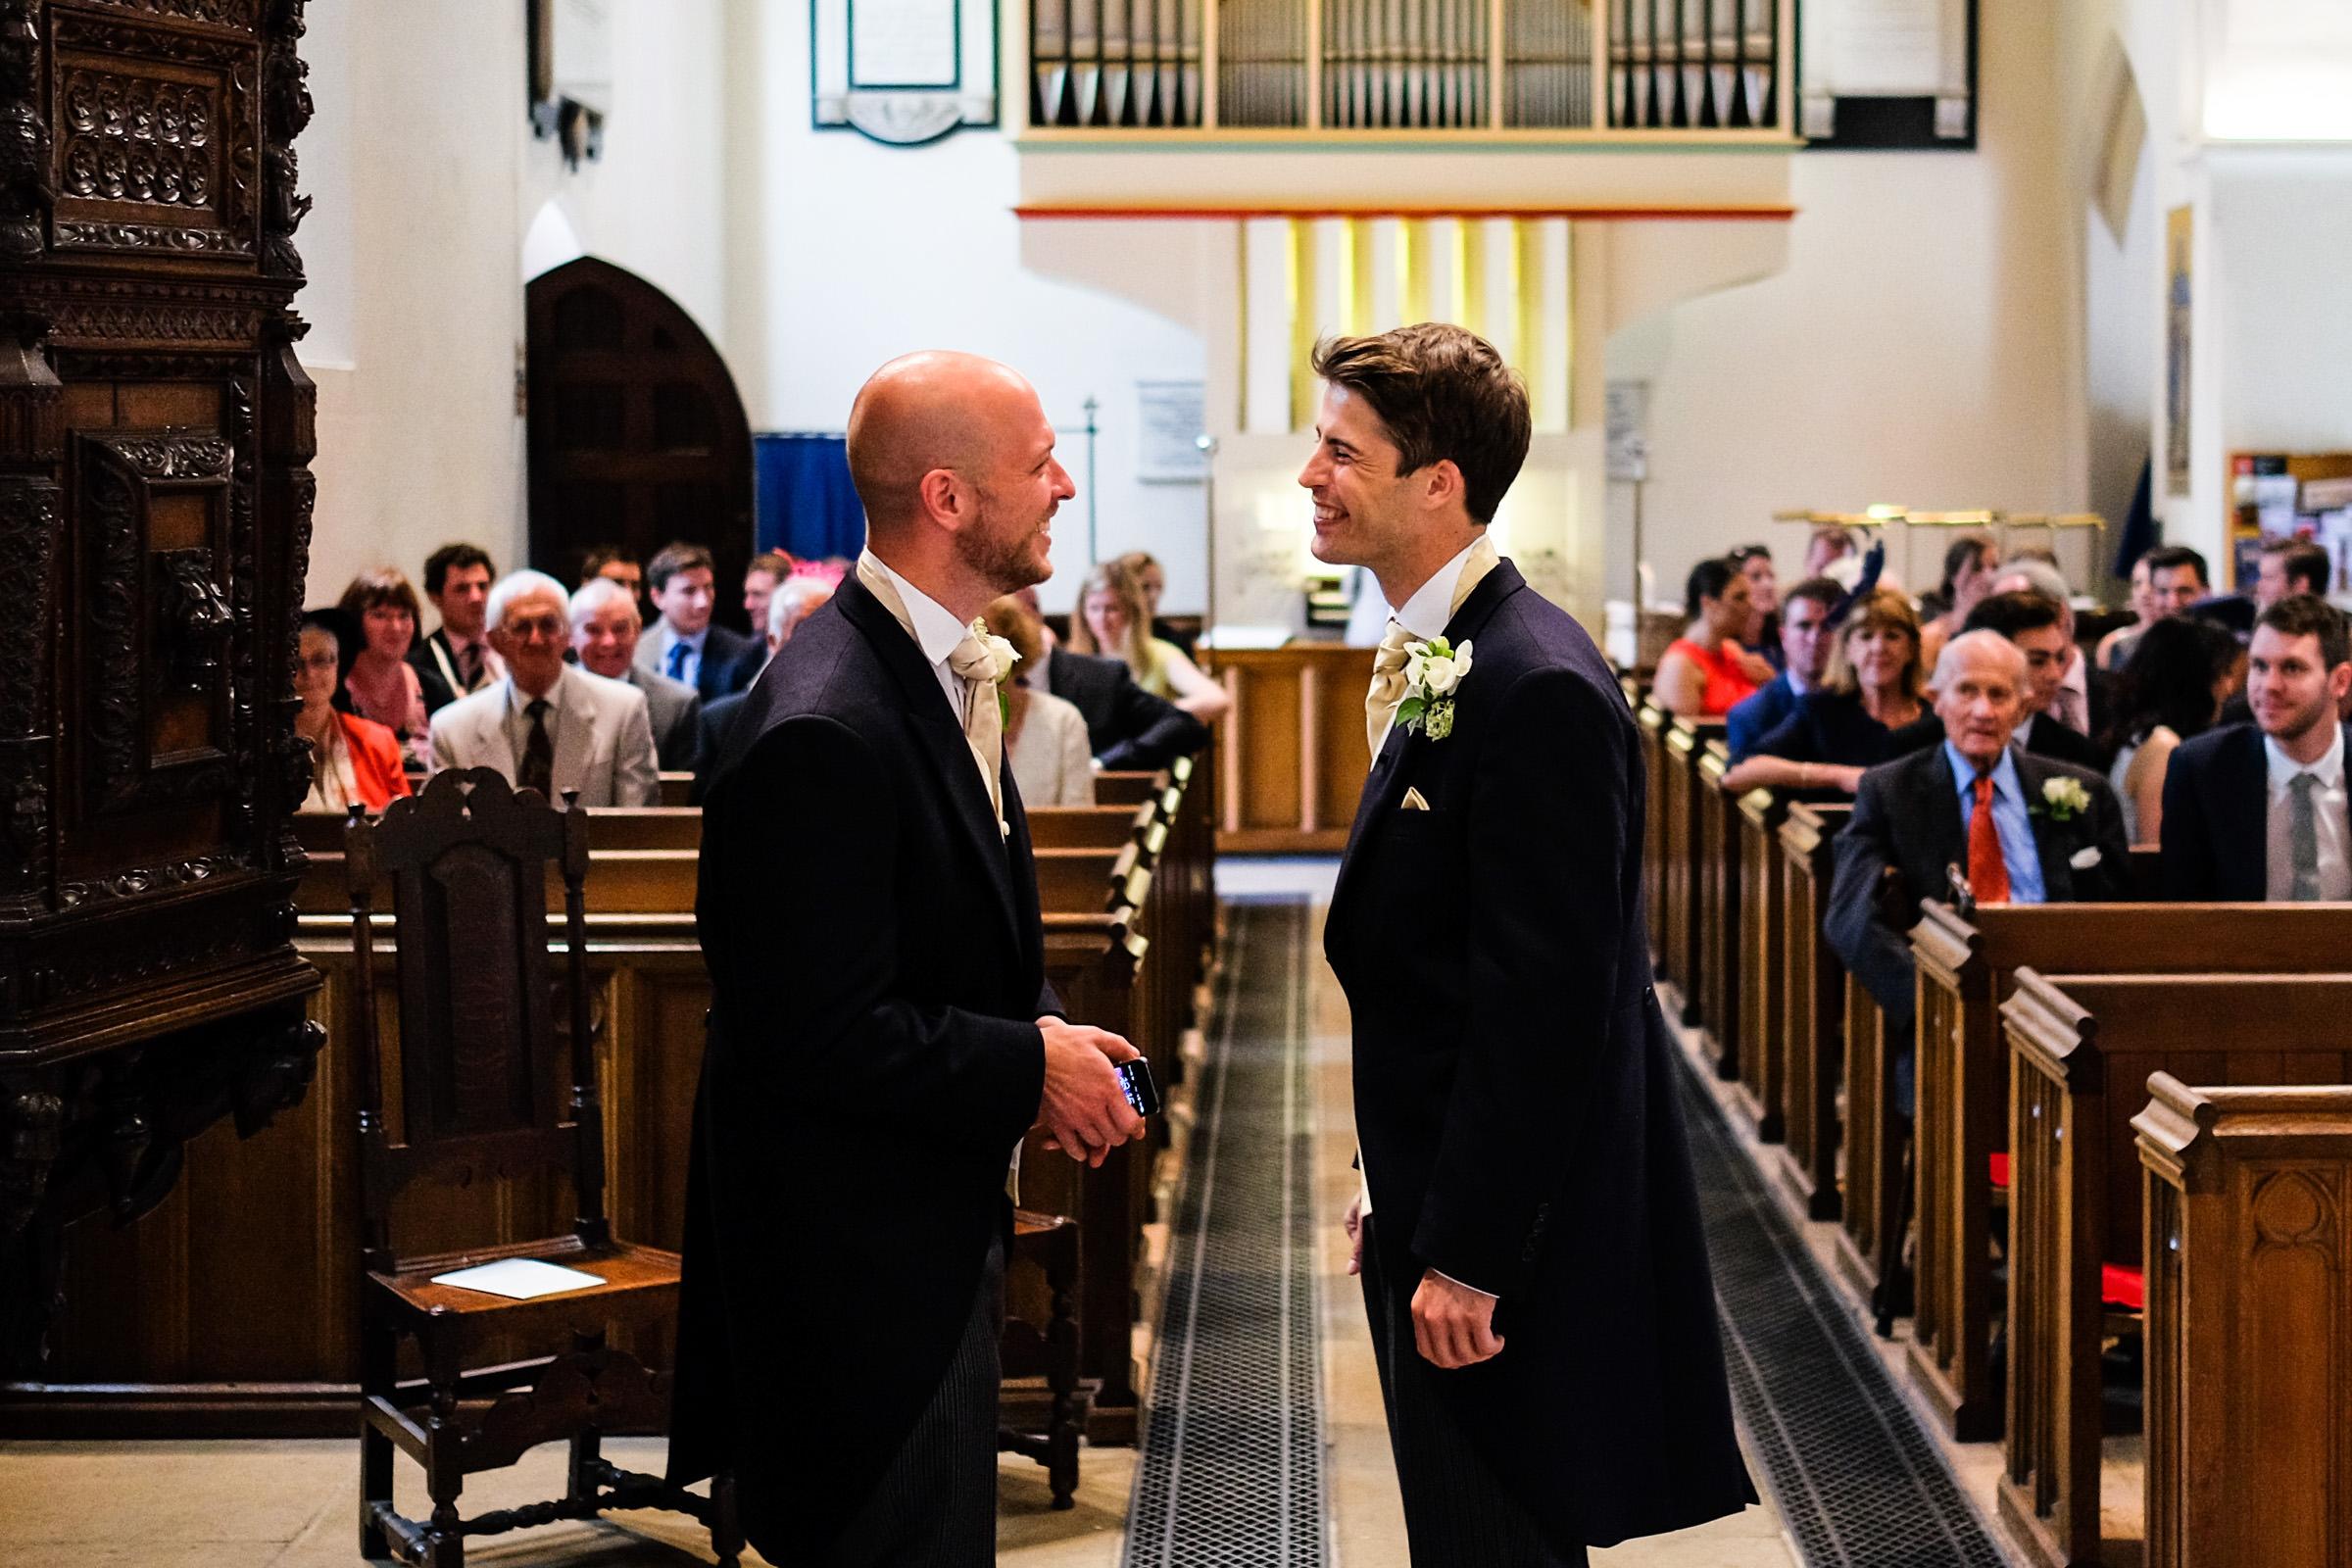 Wedding at Parkside School in Surrey 011.jpg